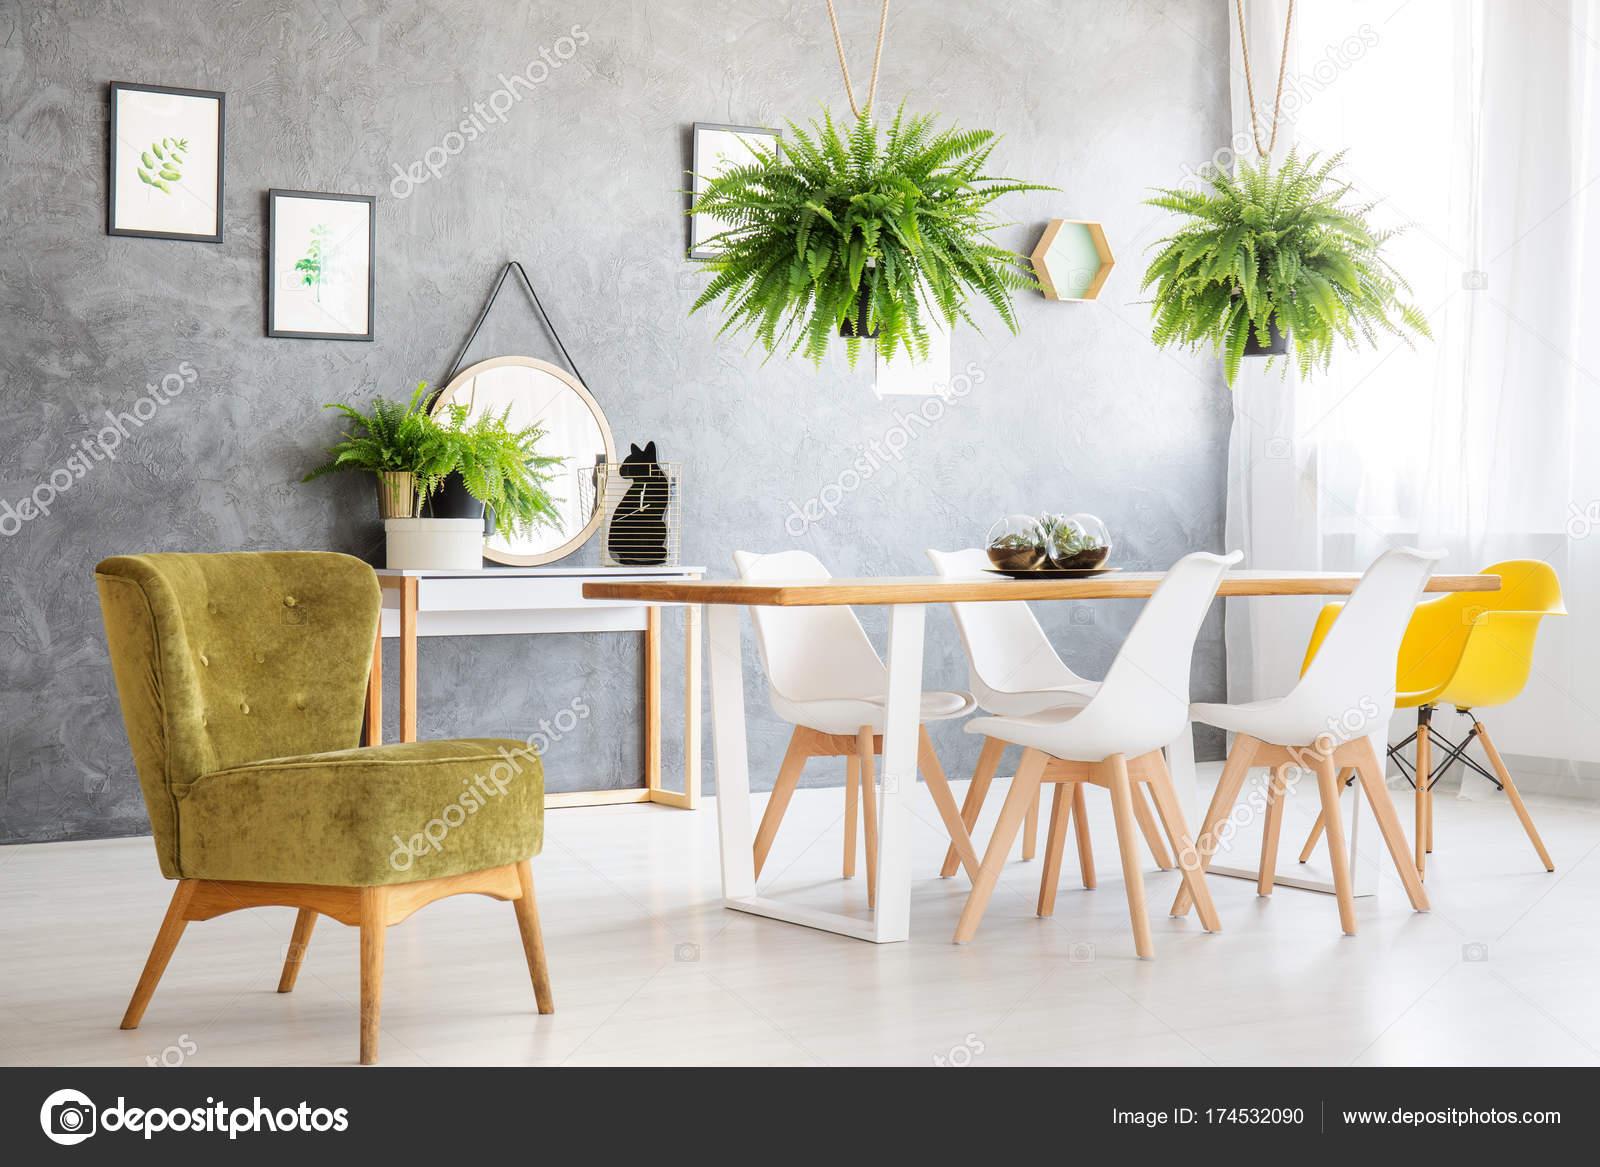 Silla vintage verde en sala — Foto de stock © photographee.eu #174532090